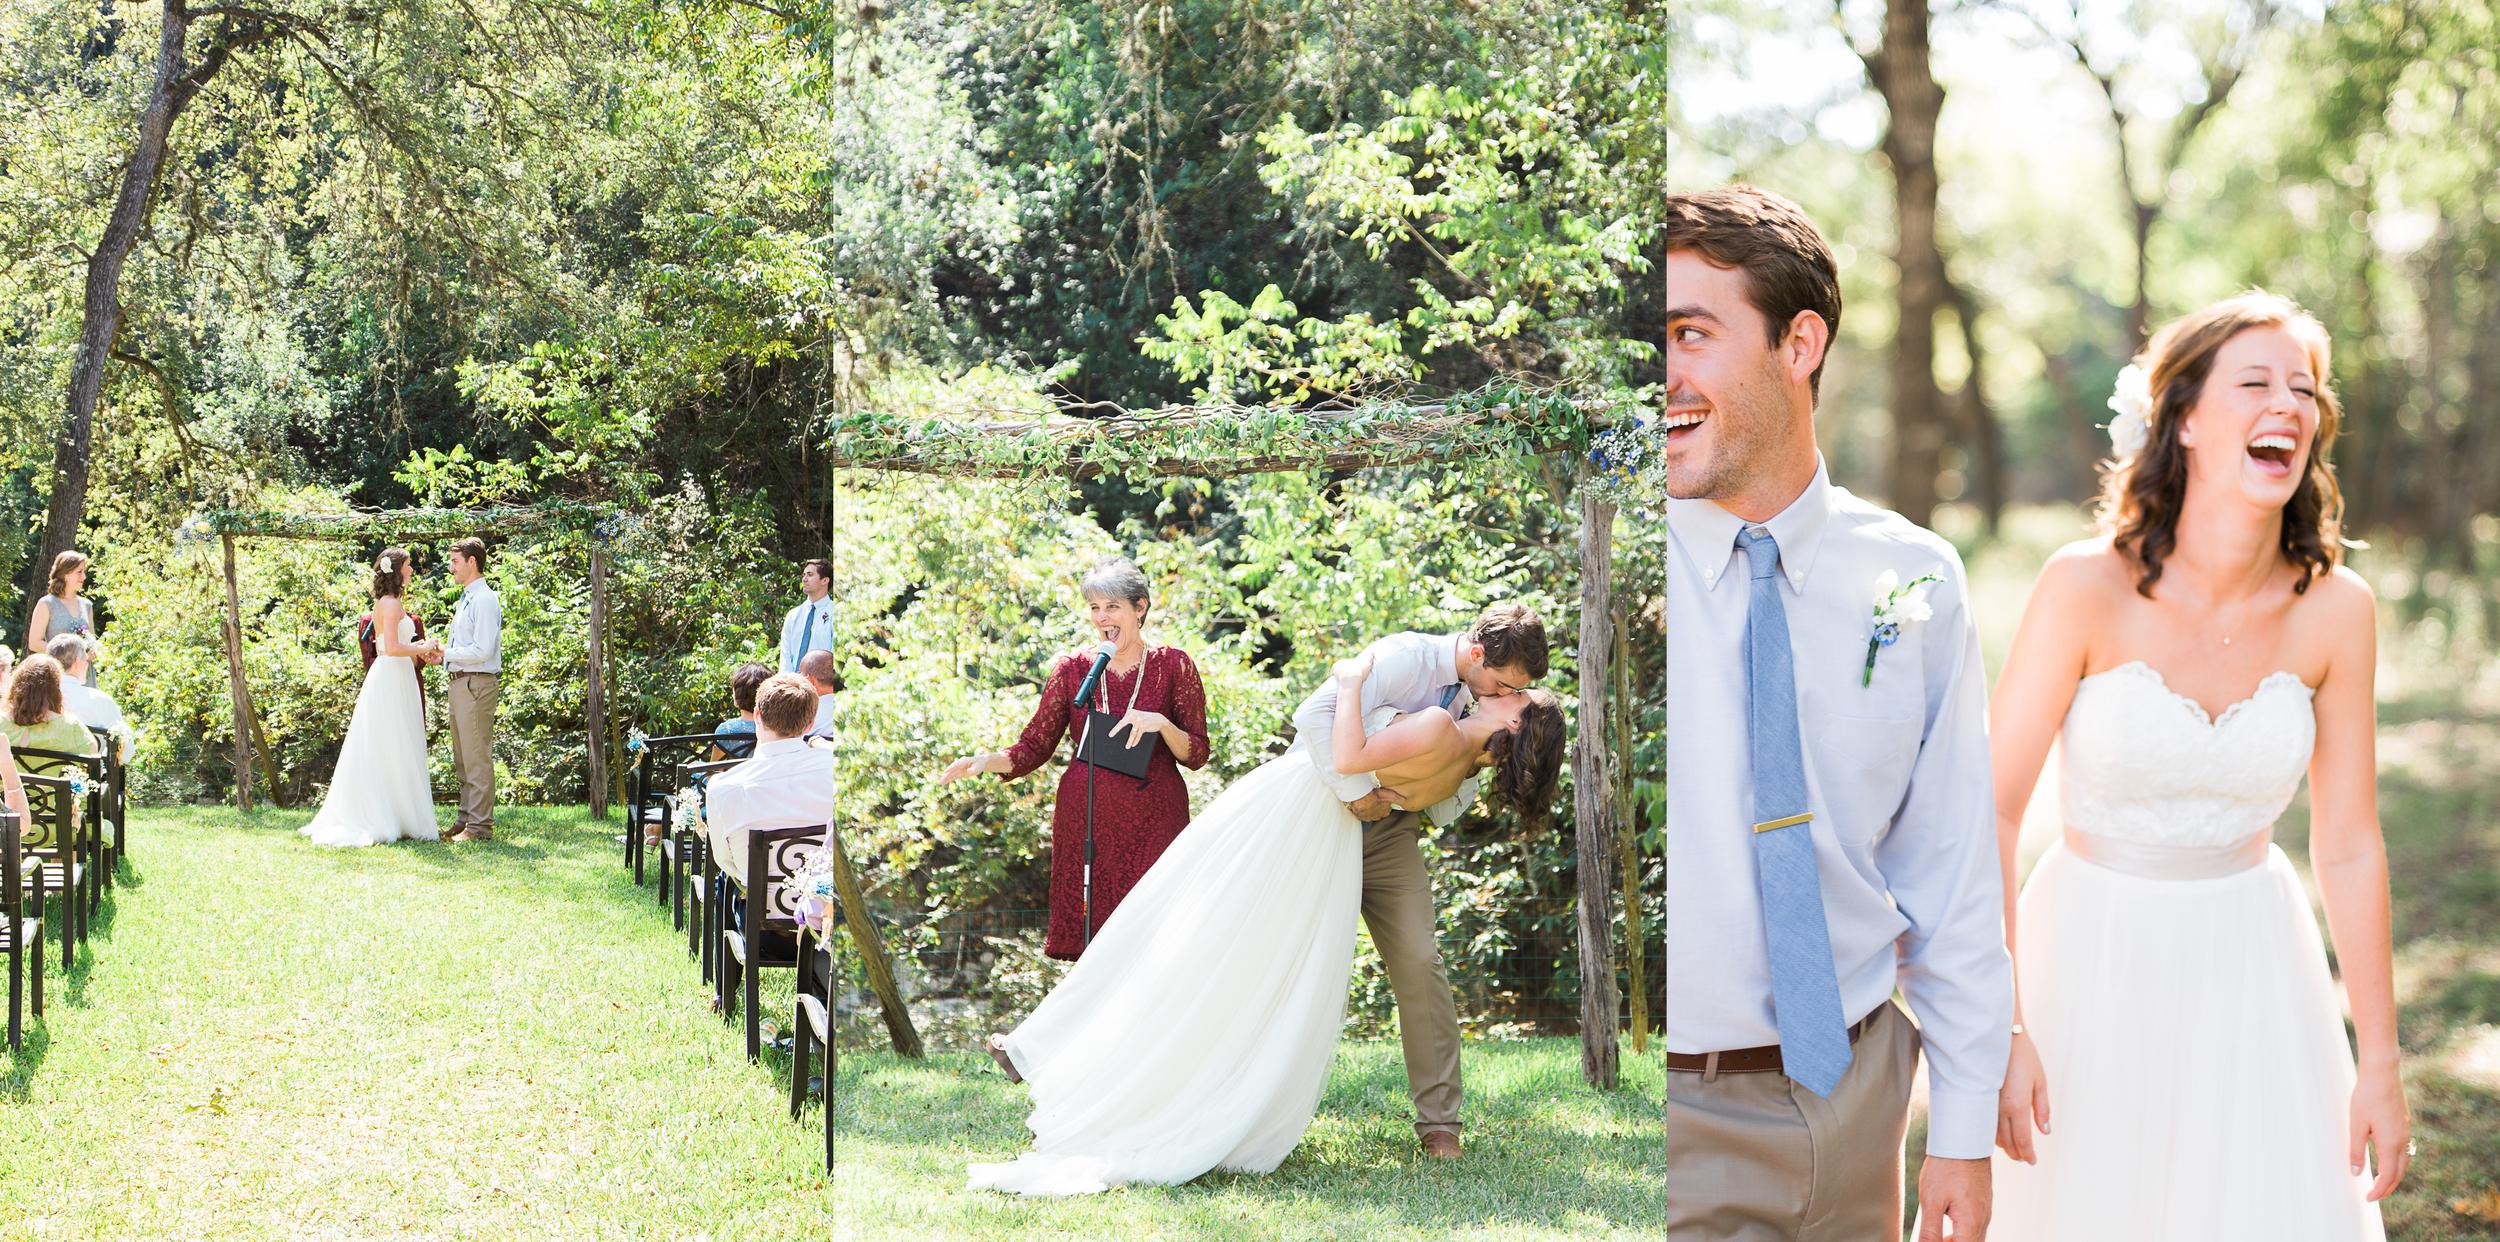 texas san antonio hill country engagement proposal couple wedding portrait adventure photographer photography